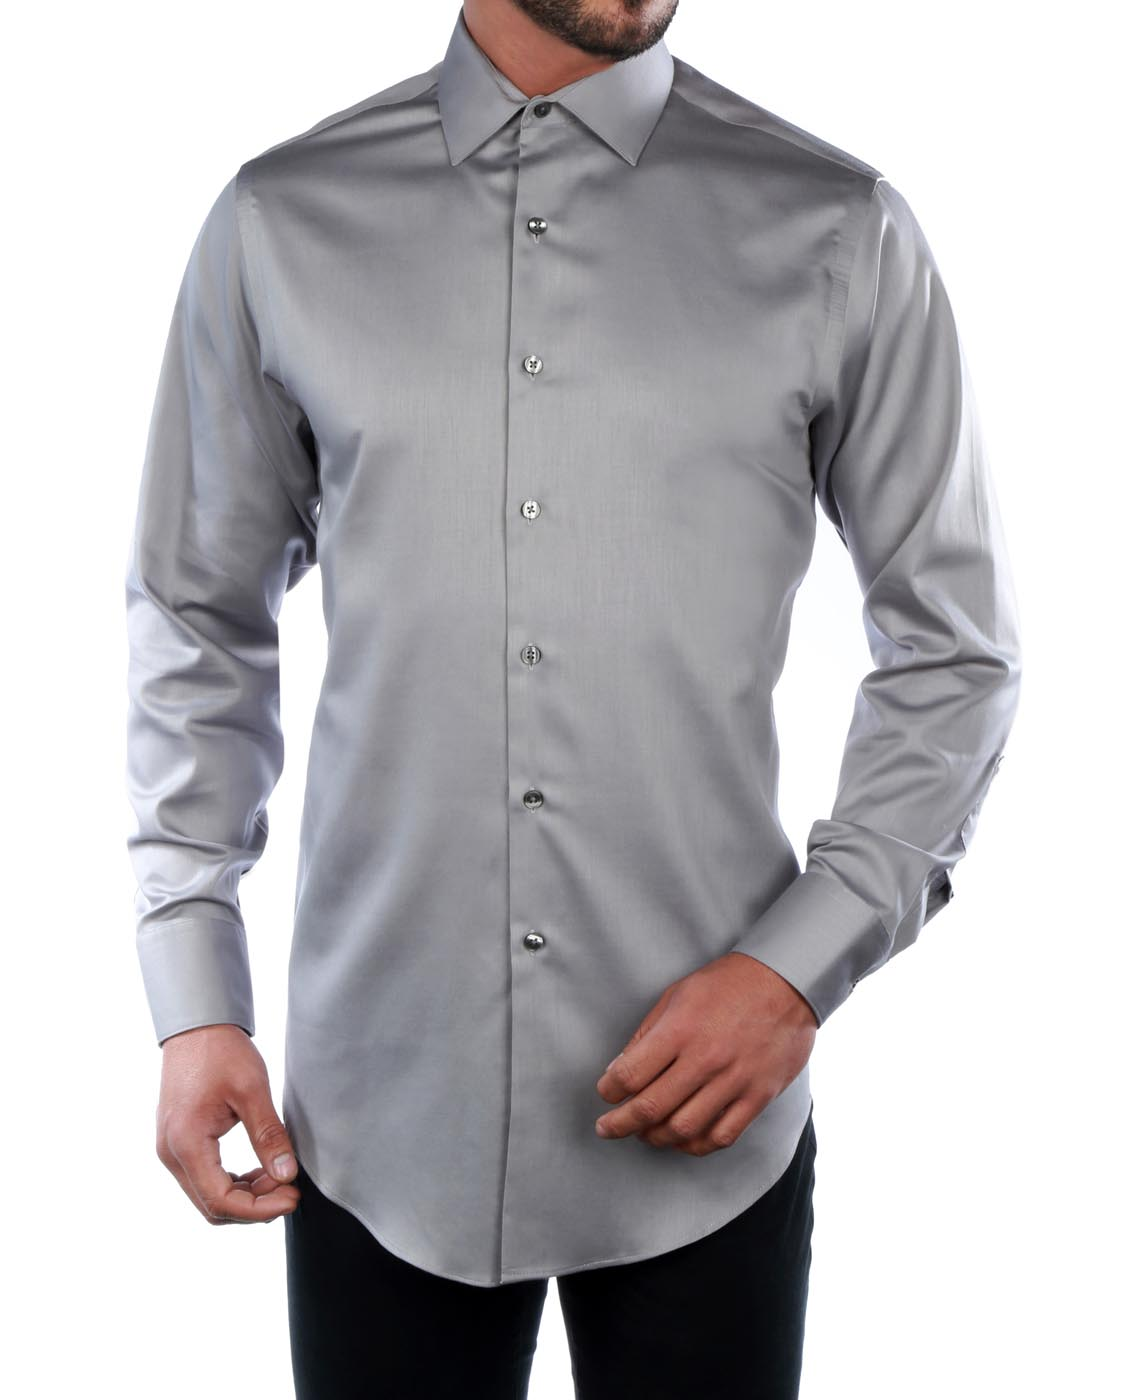 New Geoffrey Beene Classic Fit Sateen Dress Shirt 30b4255 Ebay